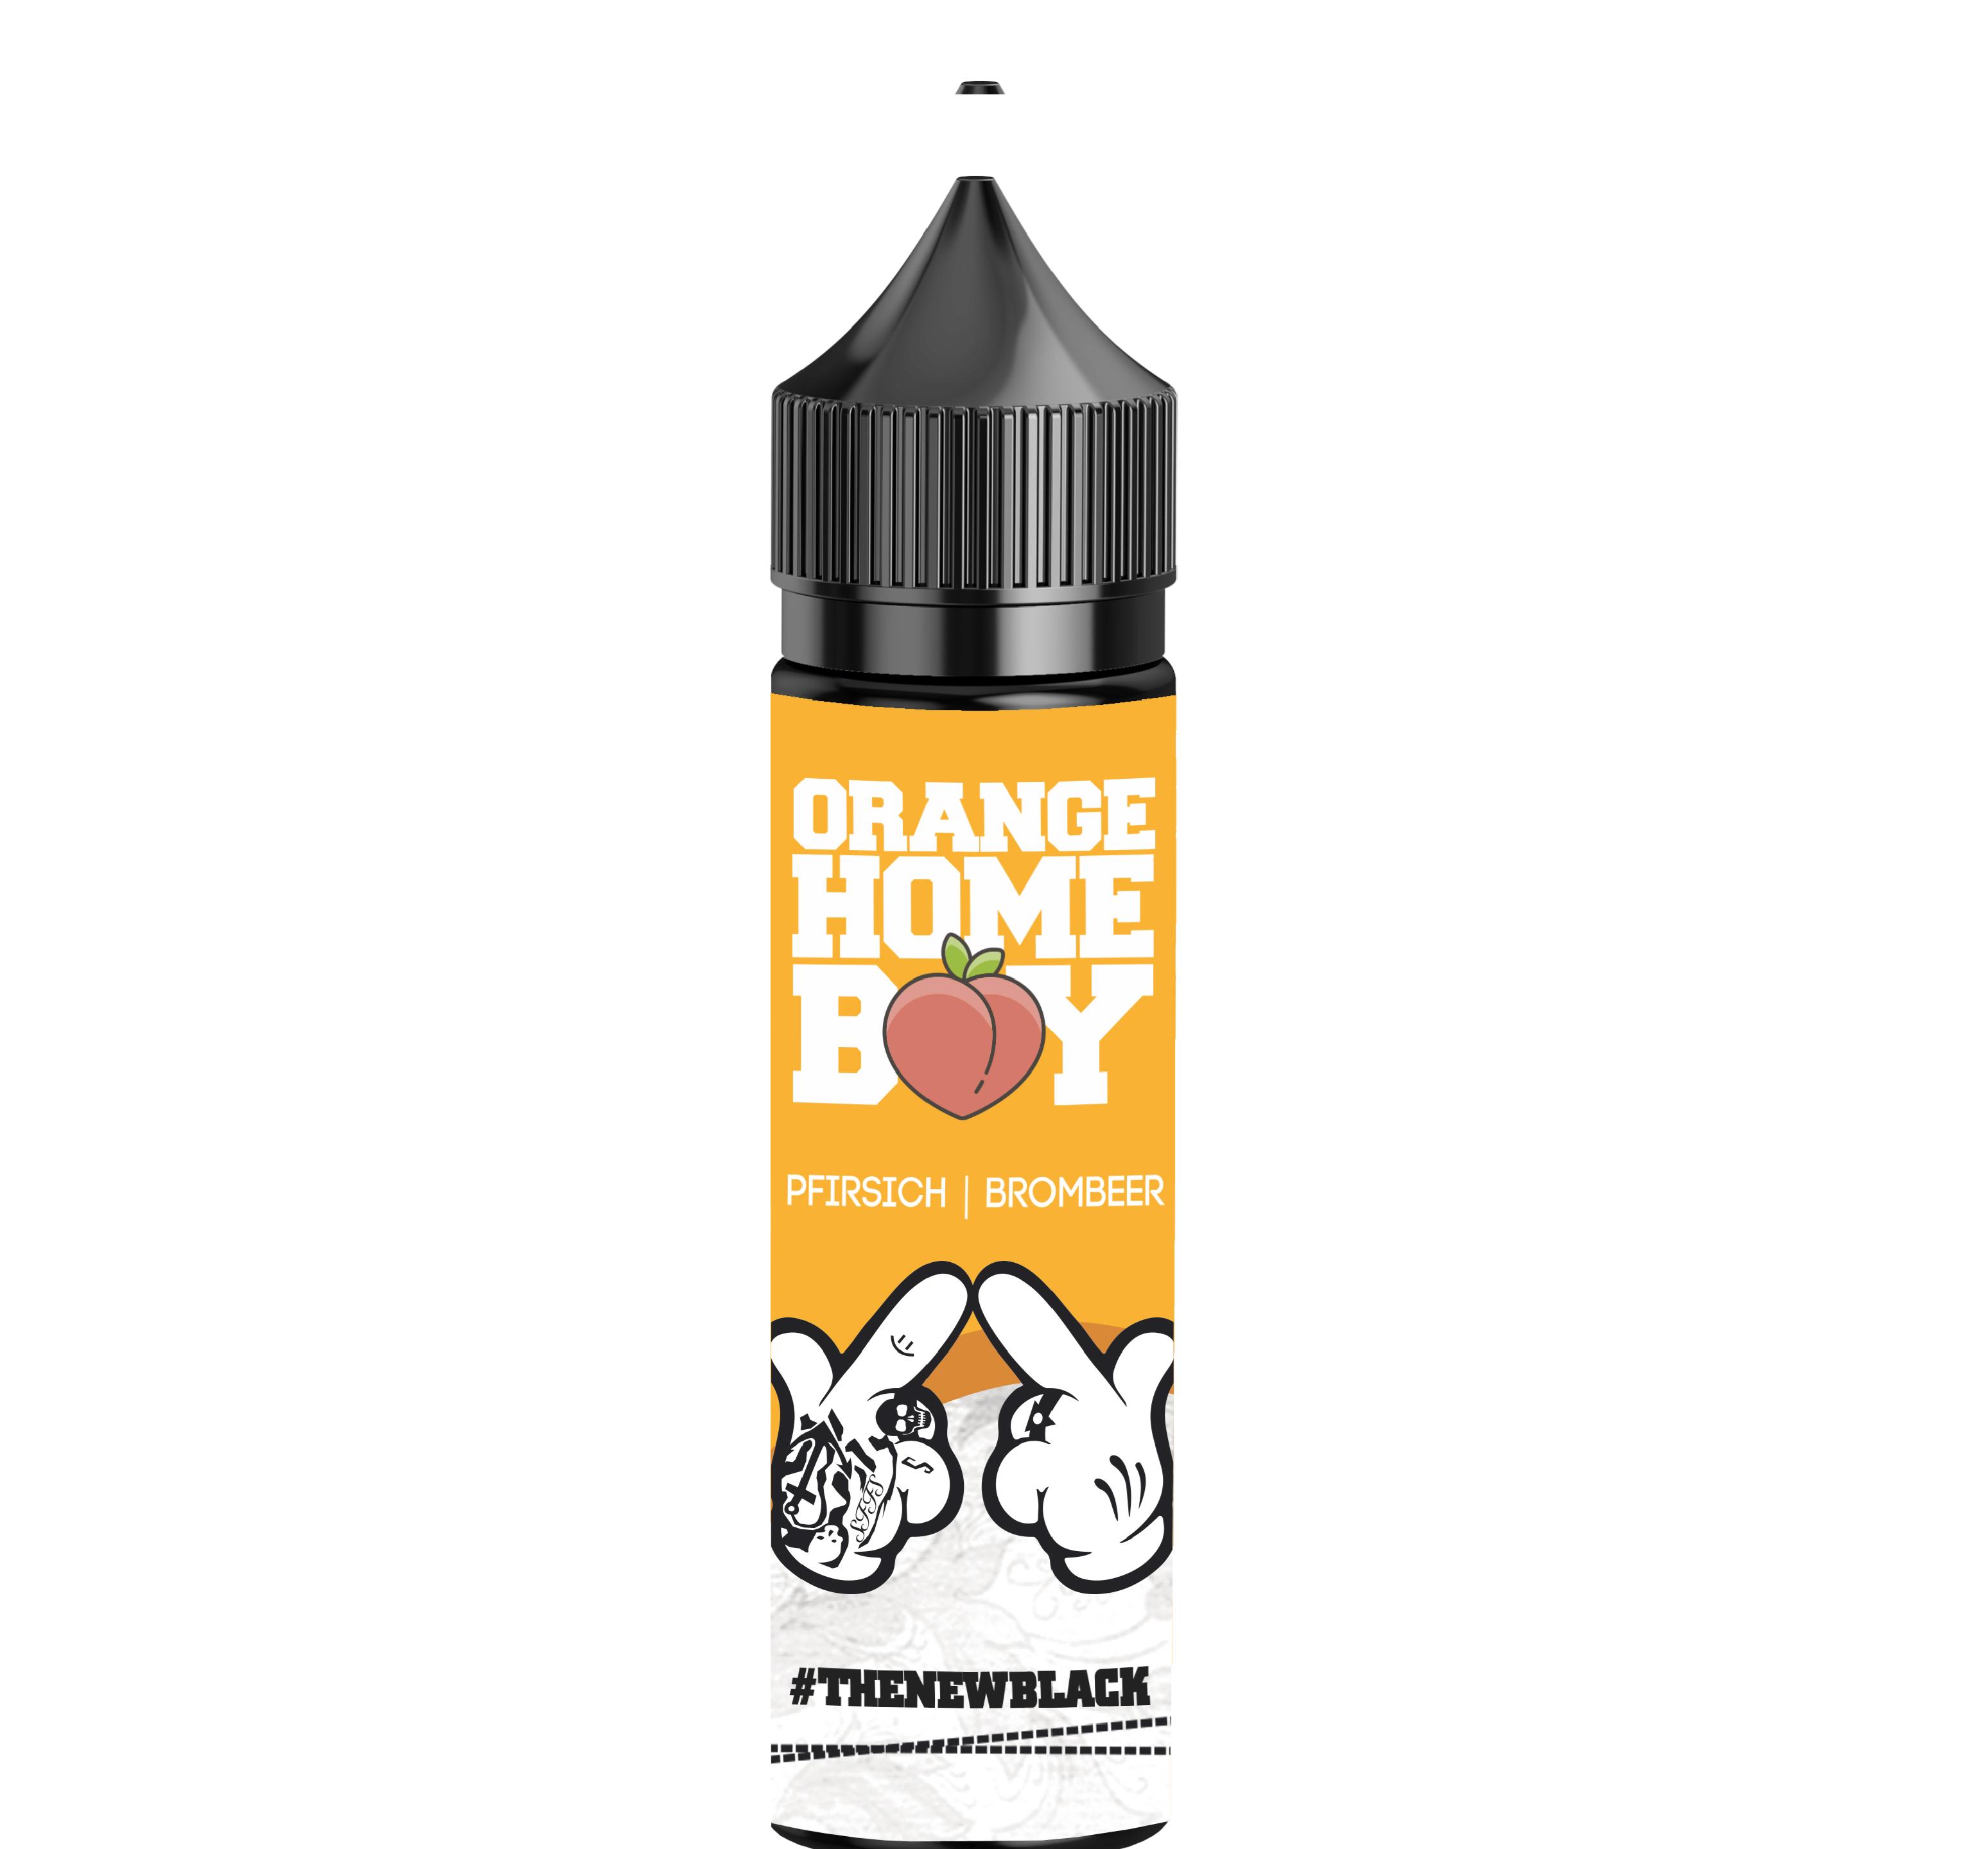 #thenewblack - Orange Home Boy Aroma 20ml